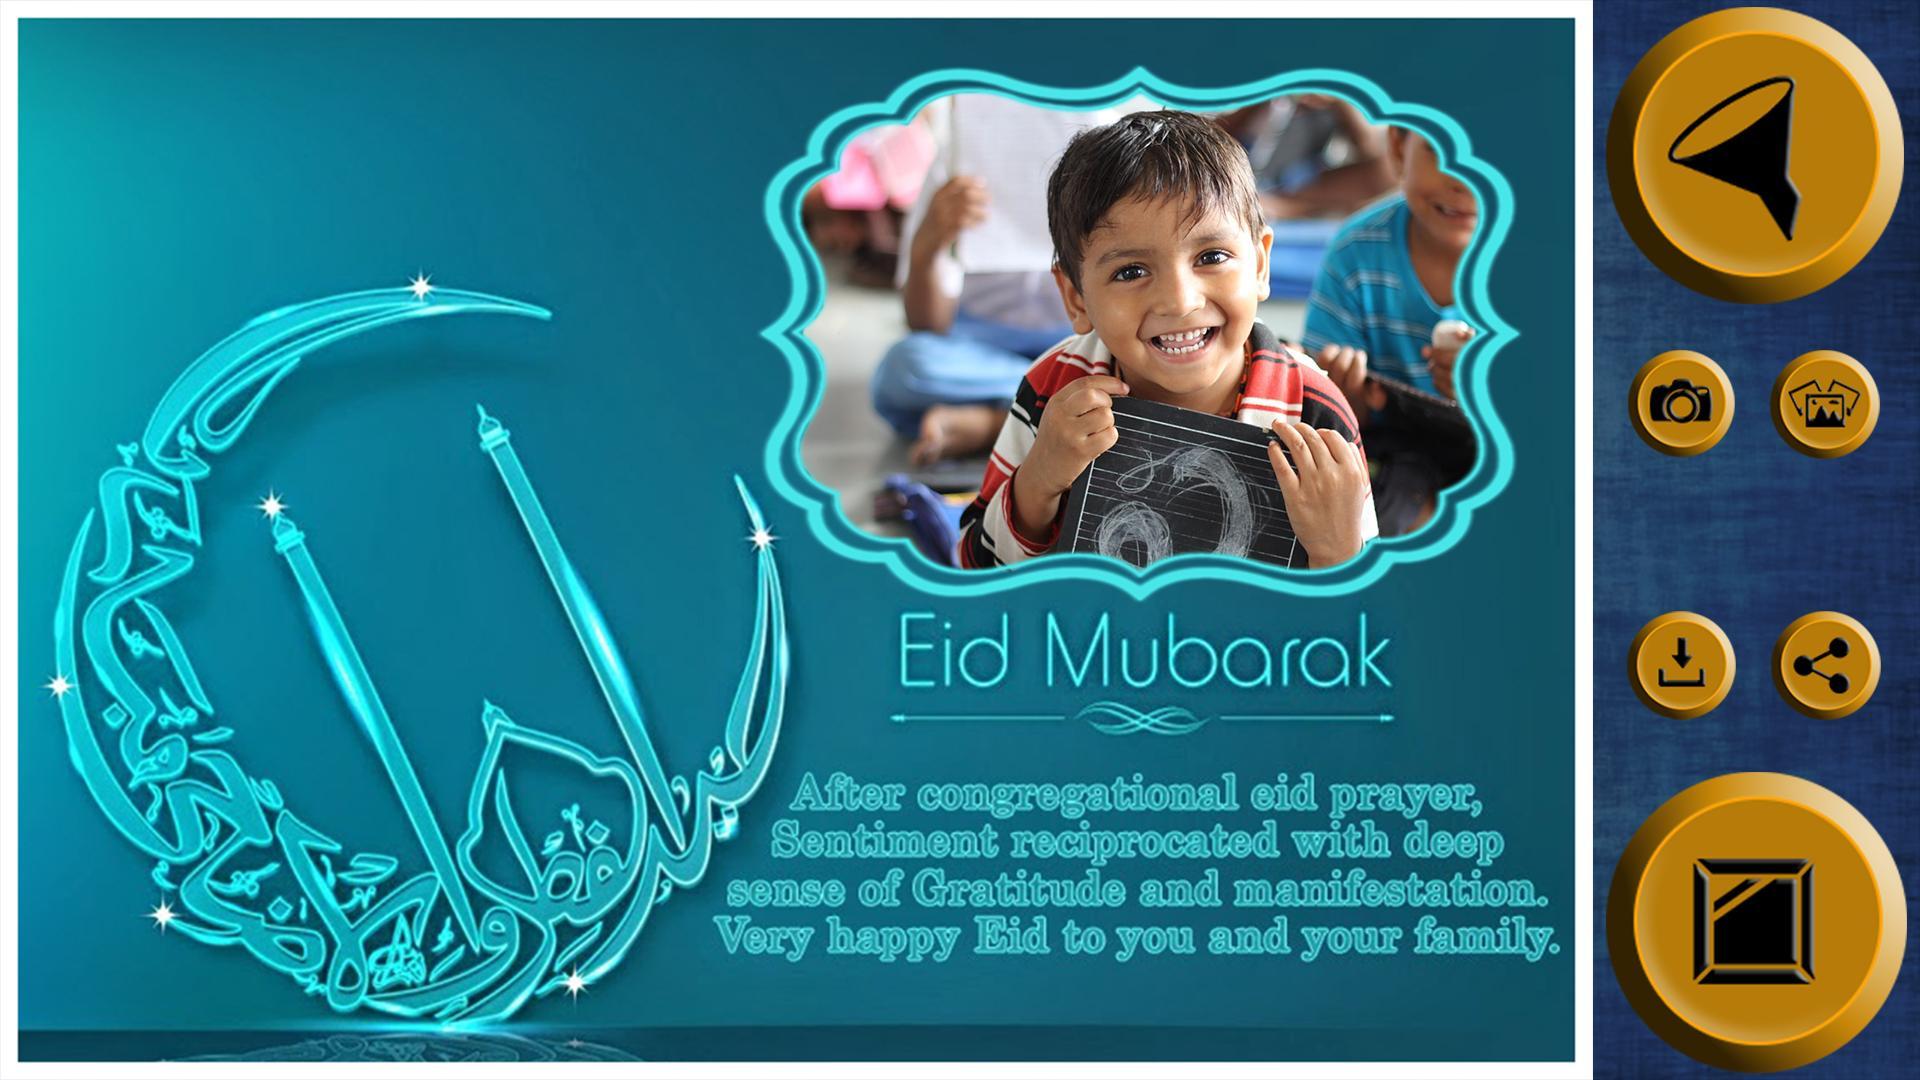 eid al adha photo frames for android apk download eid al adha photo frames for android